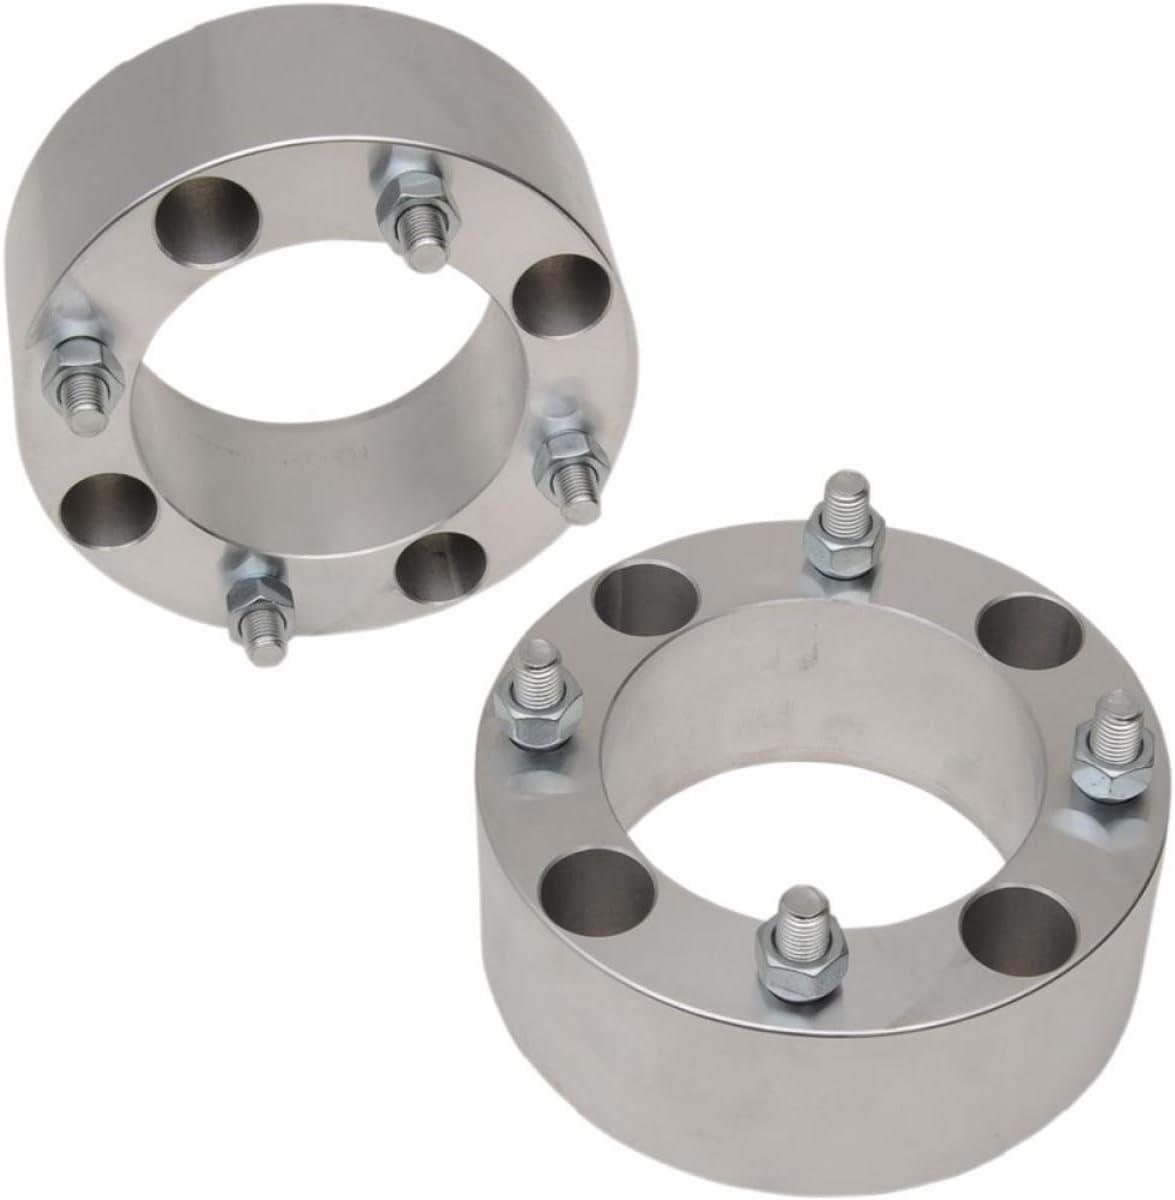 Par de espaciadores de rueda Quad ATV 4//110 de 6,35 cm de ancho 12 x 1,25